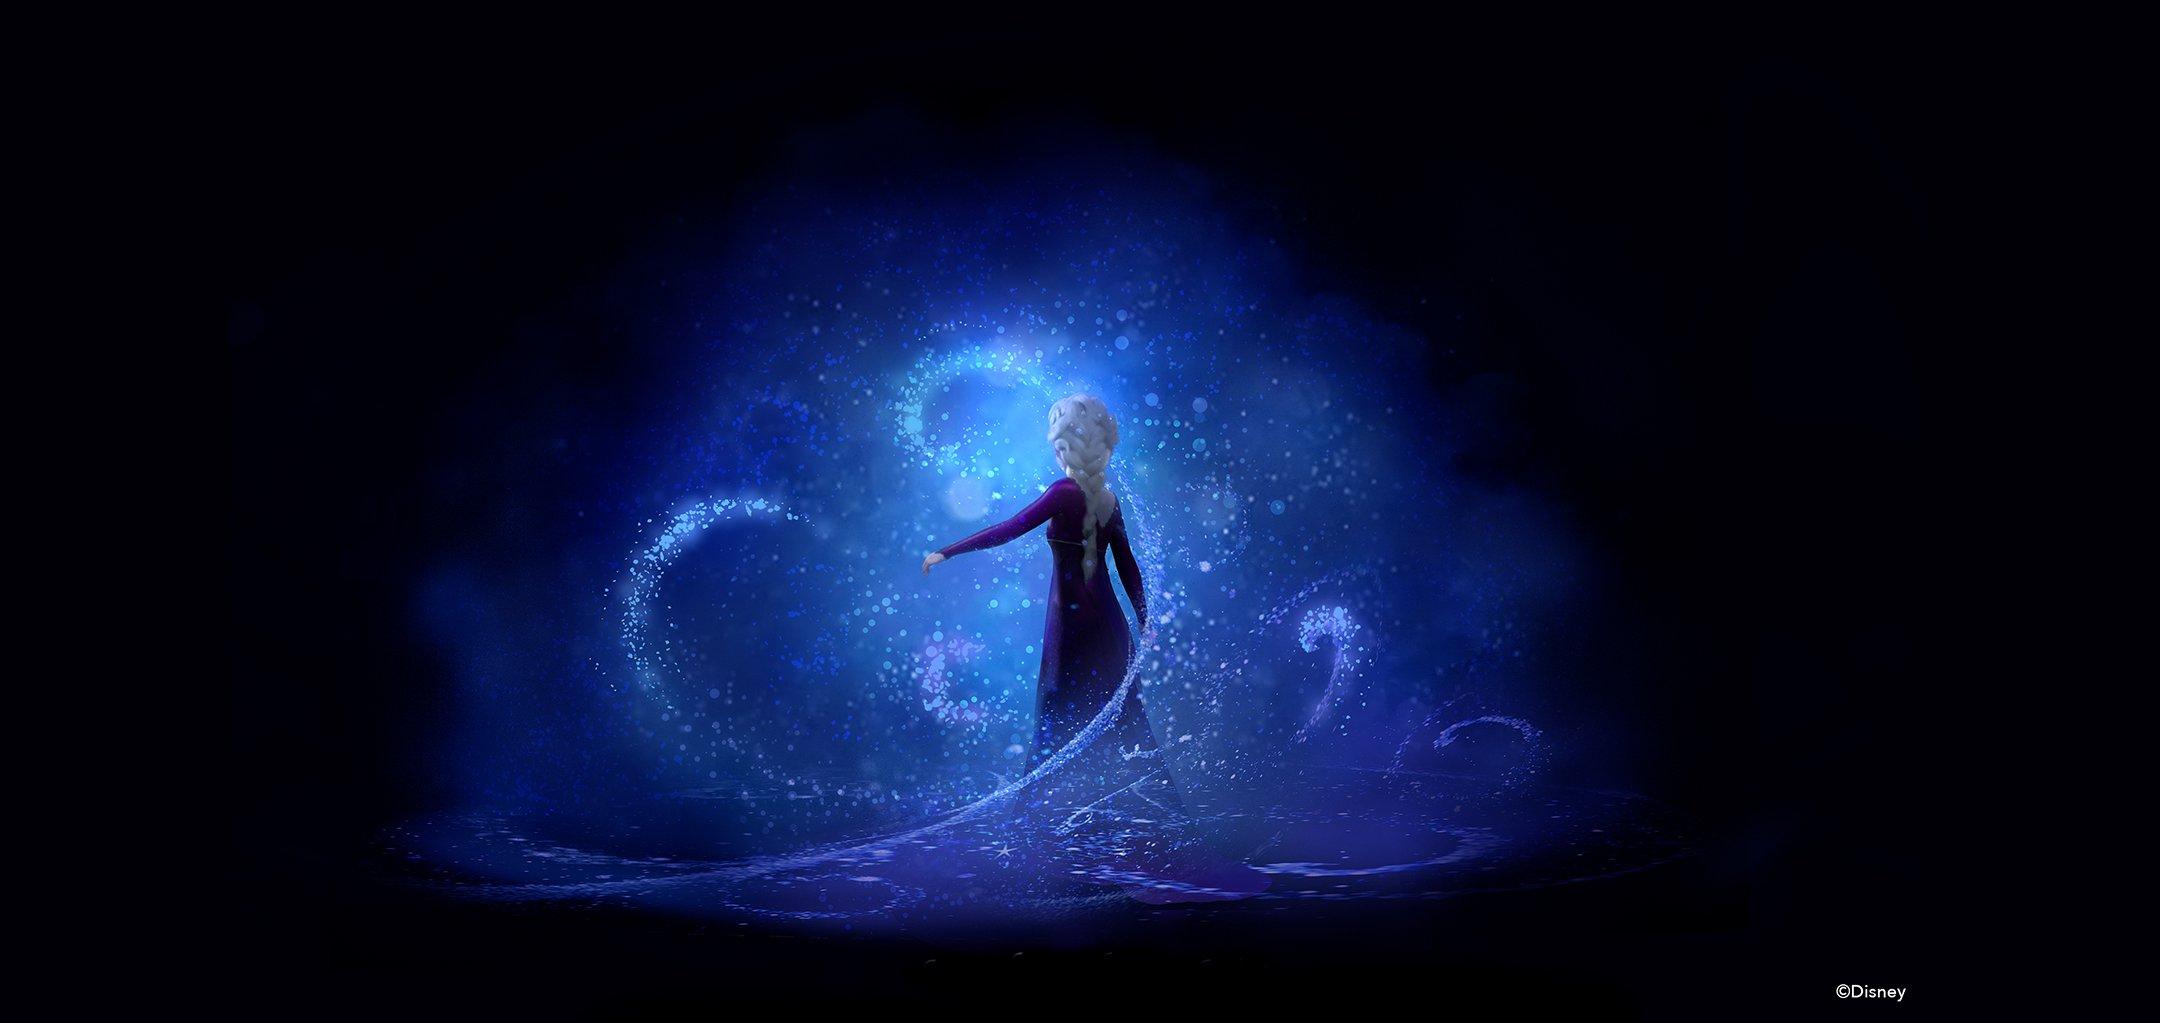 Frozen 2 (2019) Lisa Keane, Concept Art, digital painting. © Disney